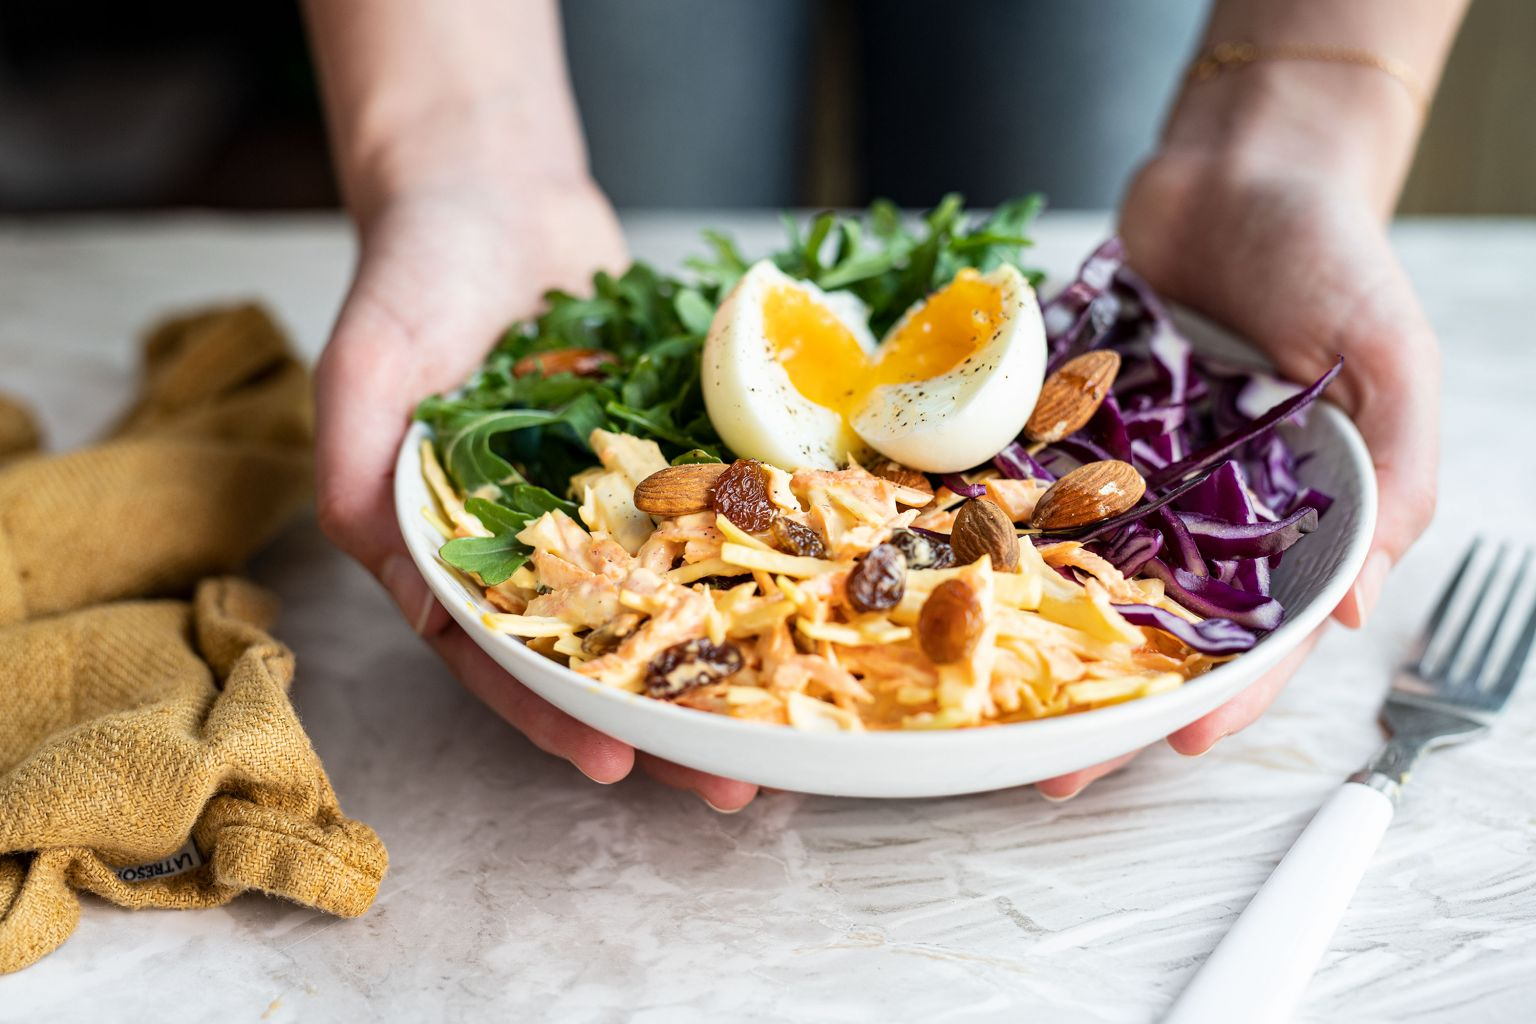 Salade de coleslaw, oeuf poché et raisin secs